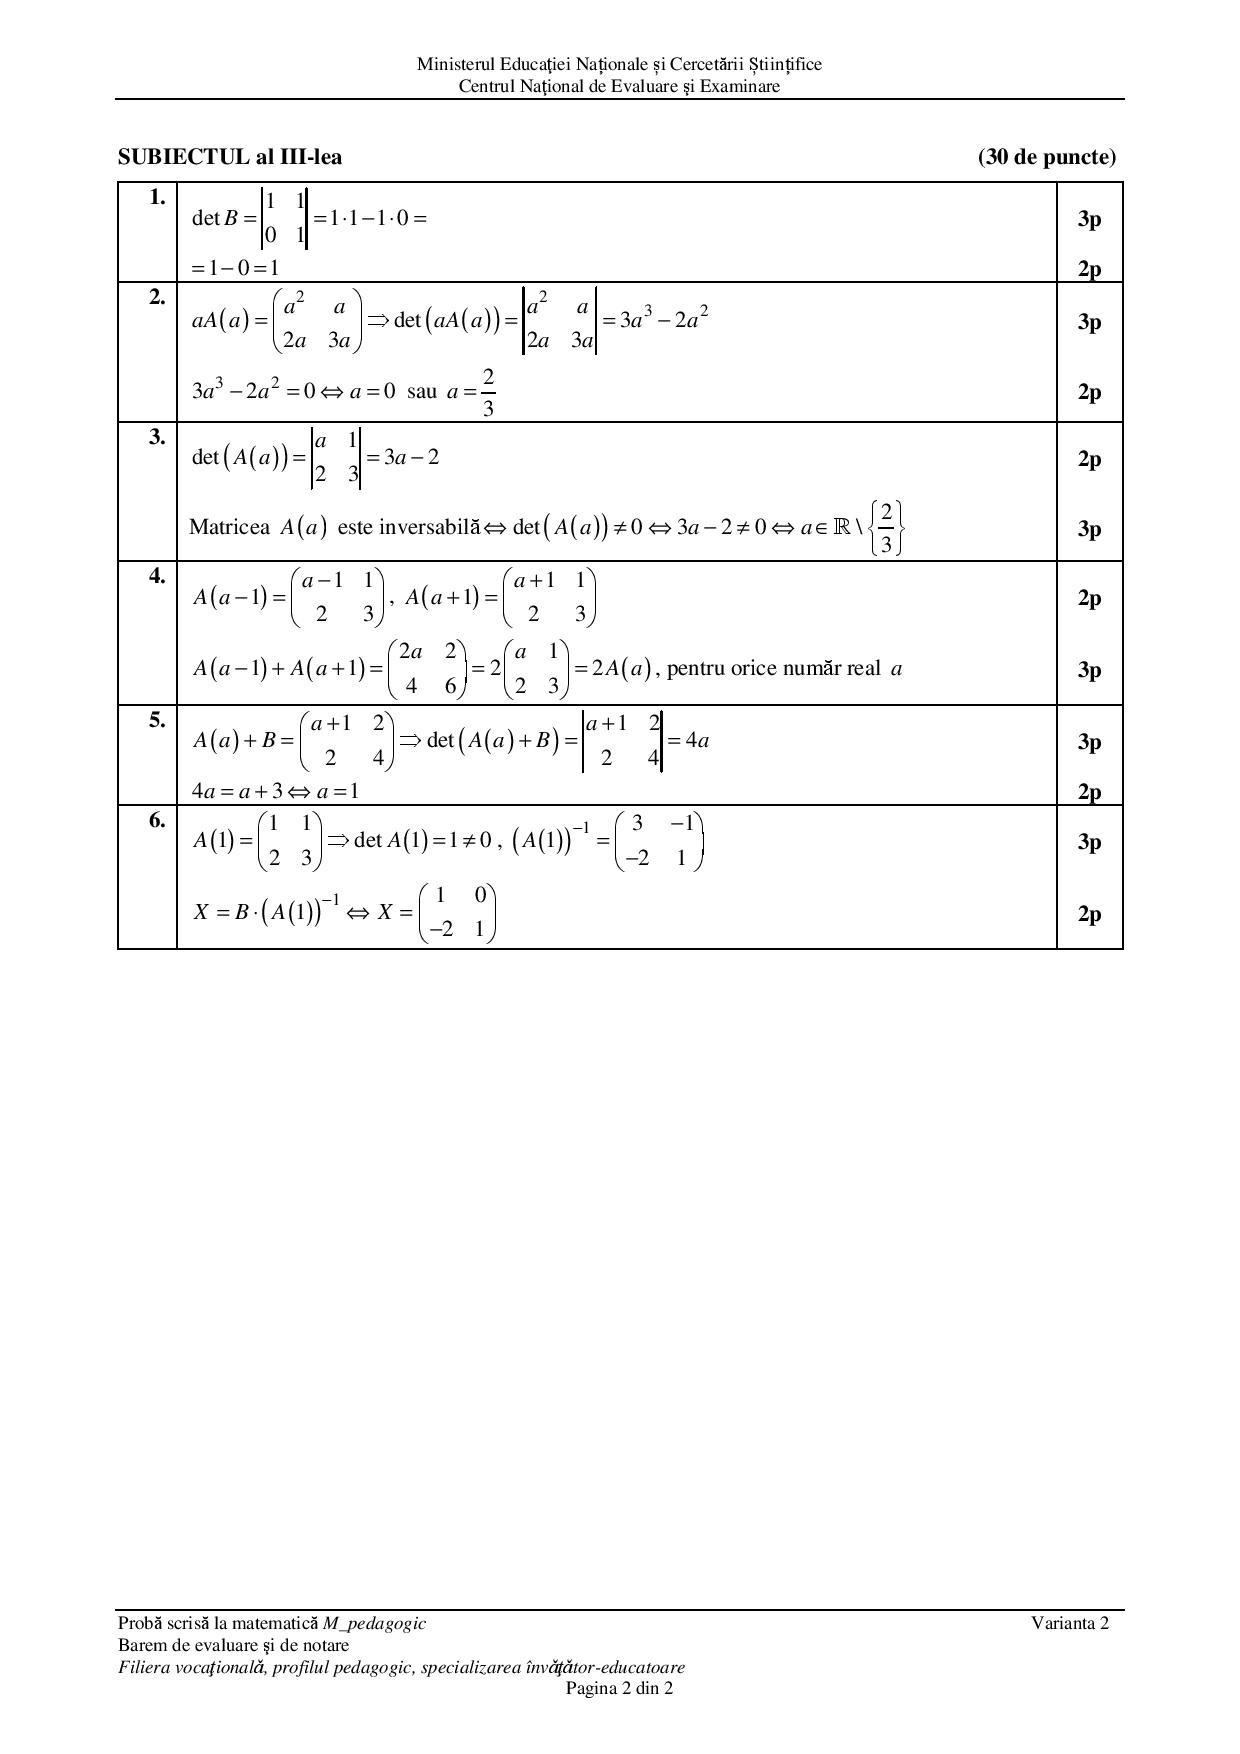 E_c_matematica_M_pedagogic_2016_bar_02_LRO-page-002